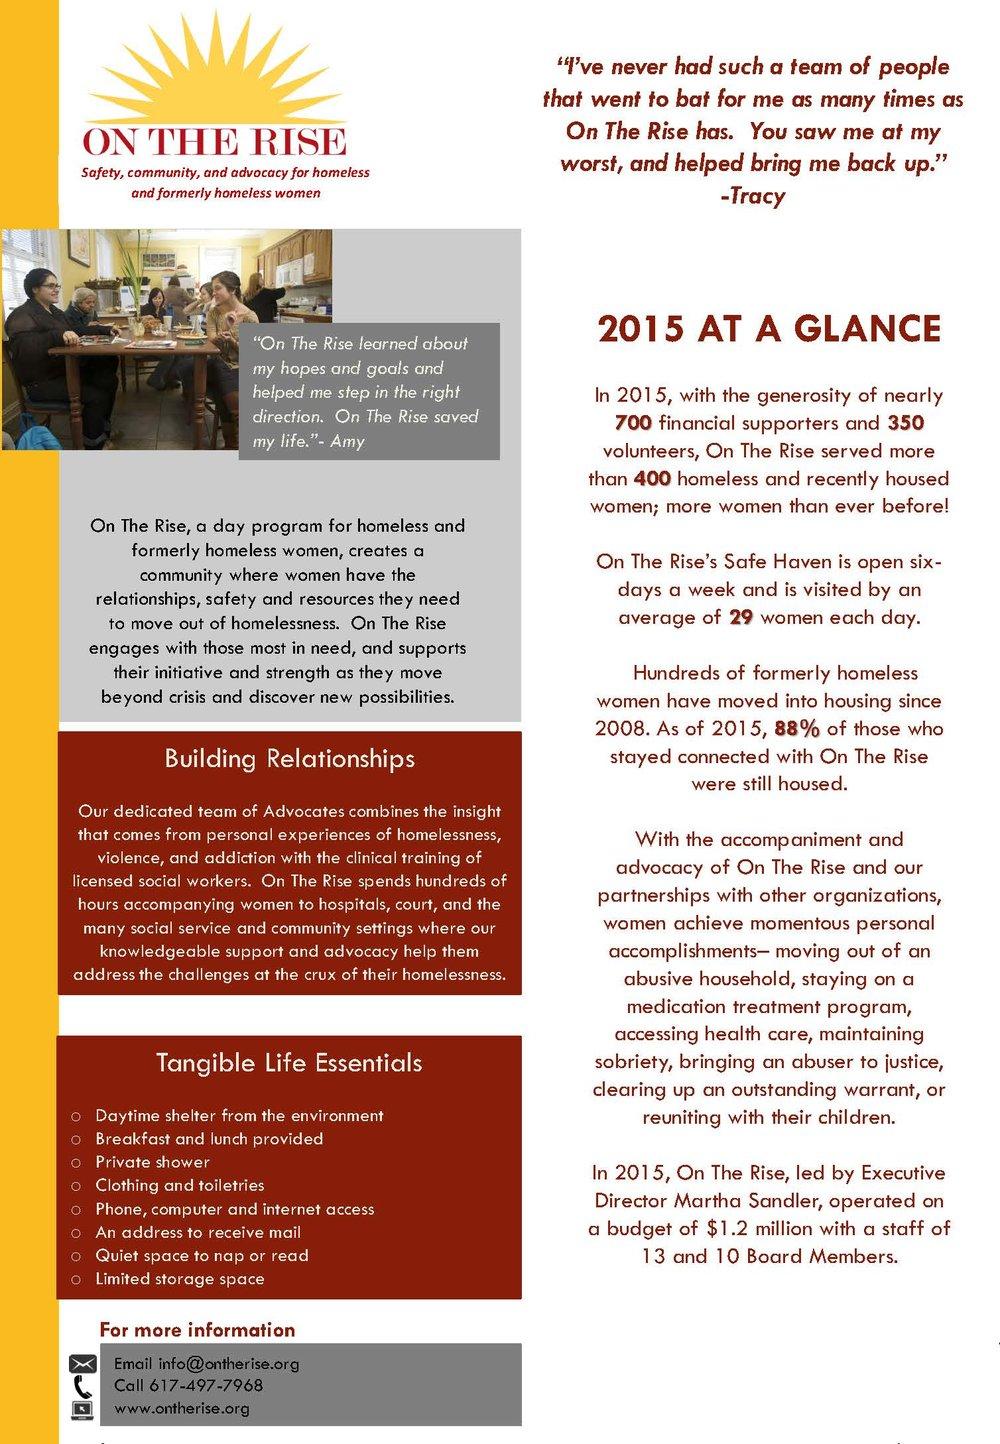 OTR Annual Report 2015 tagline (4)_Page_1.jpg